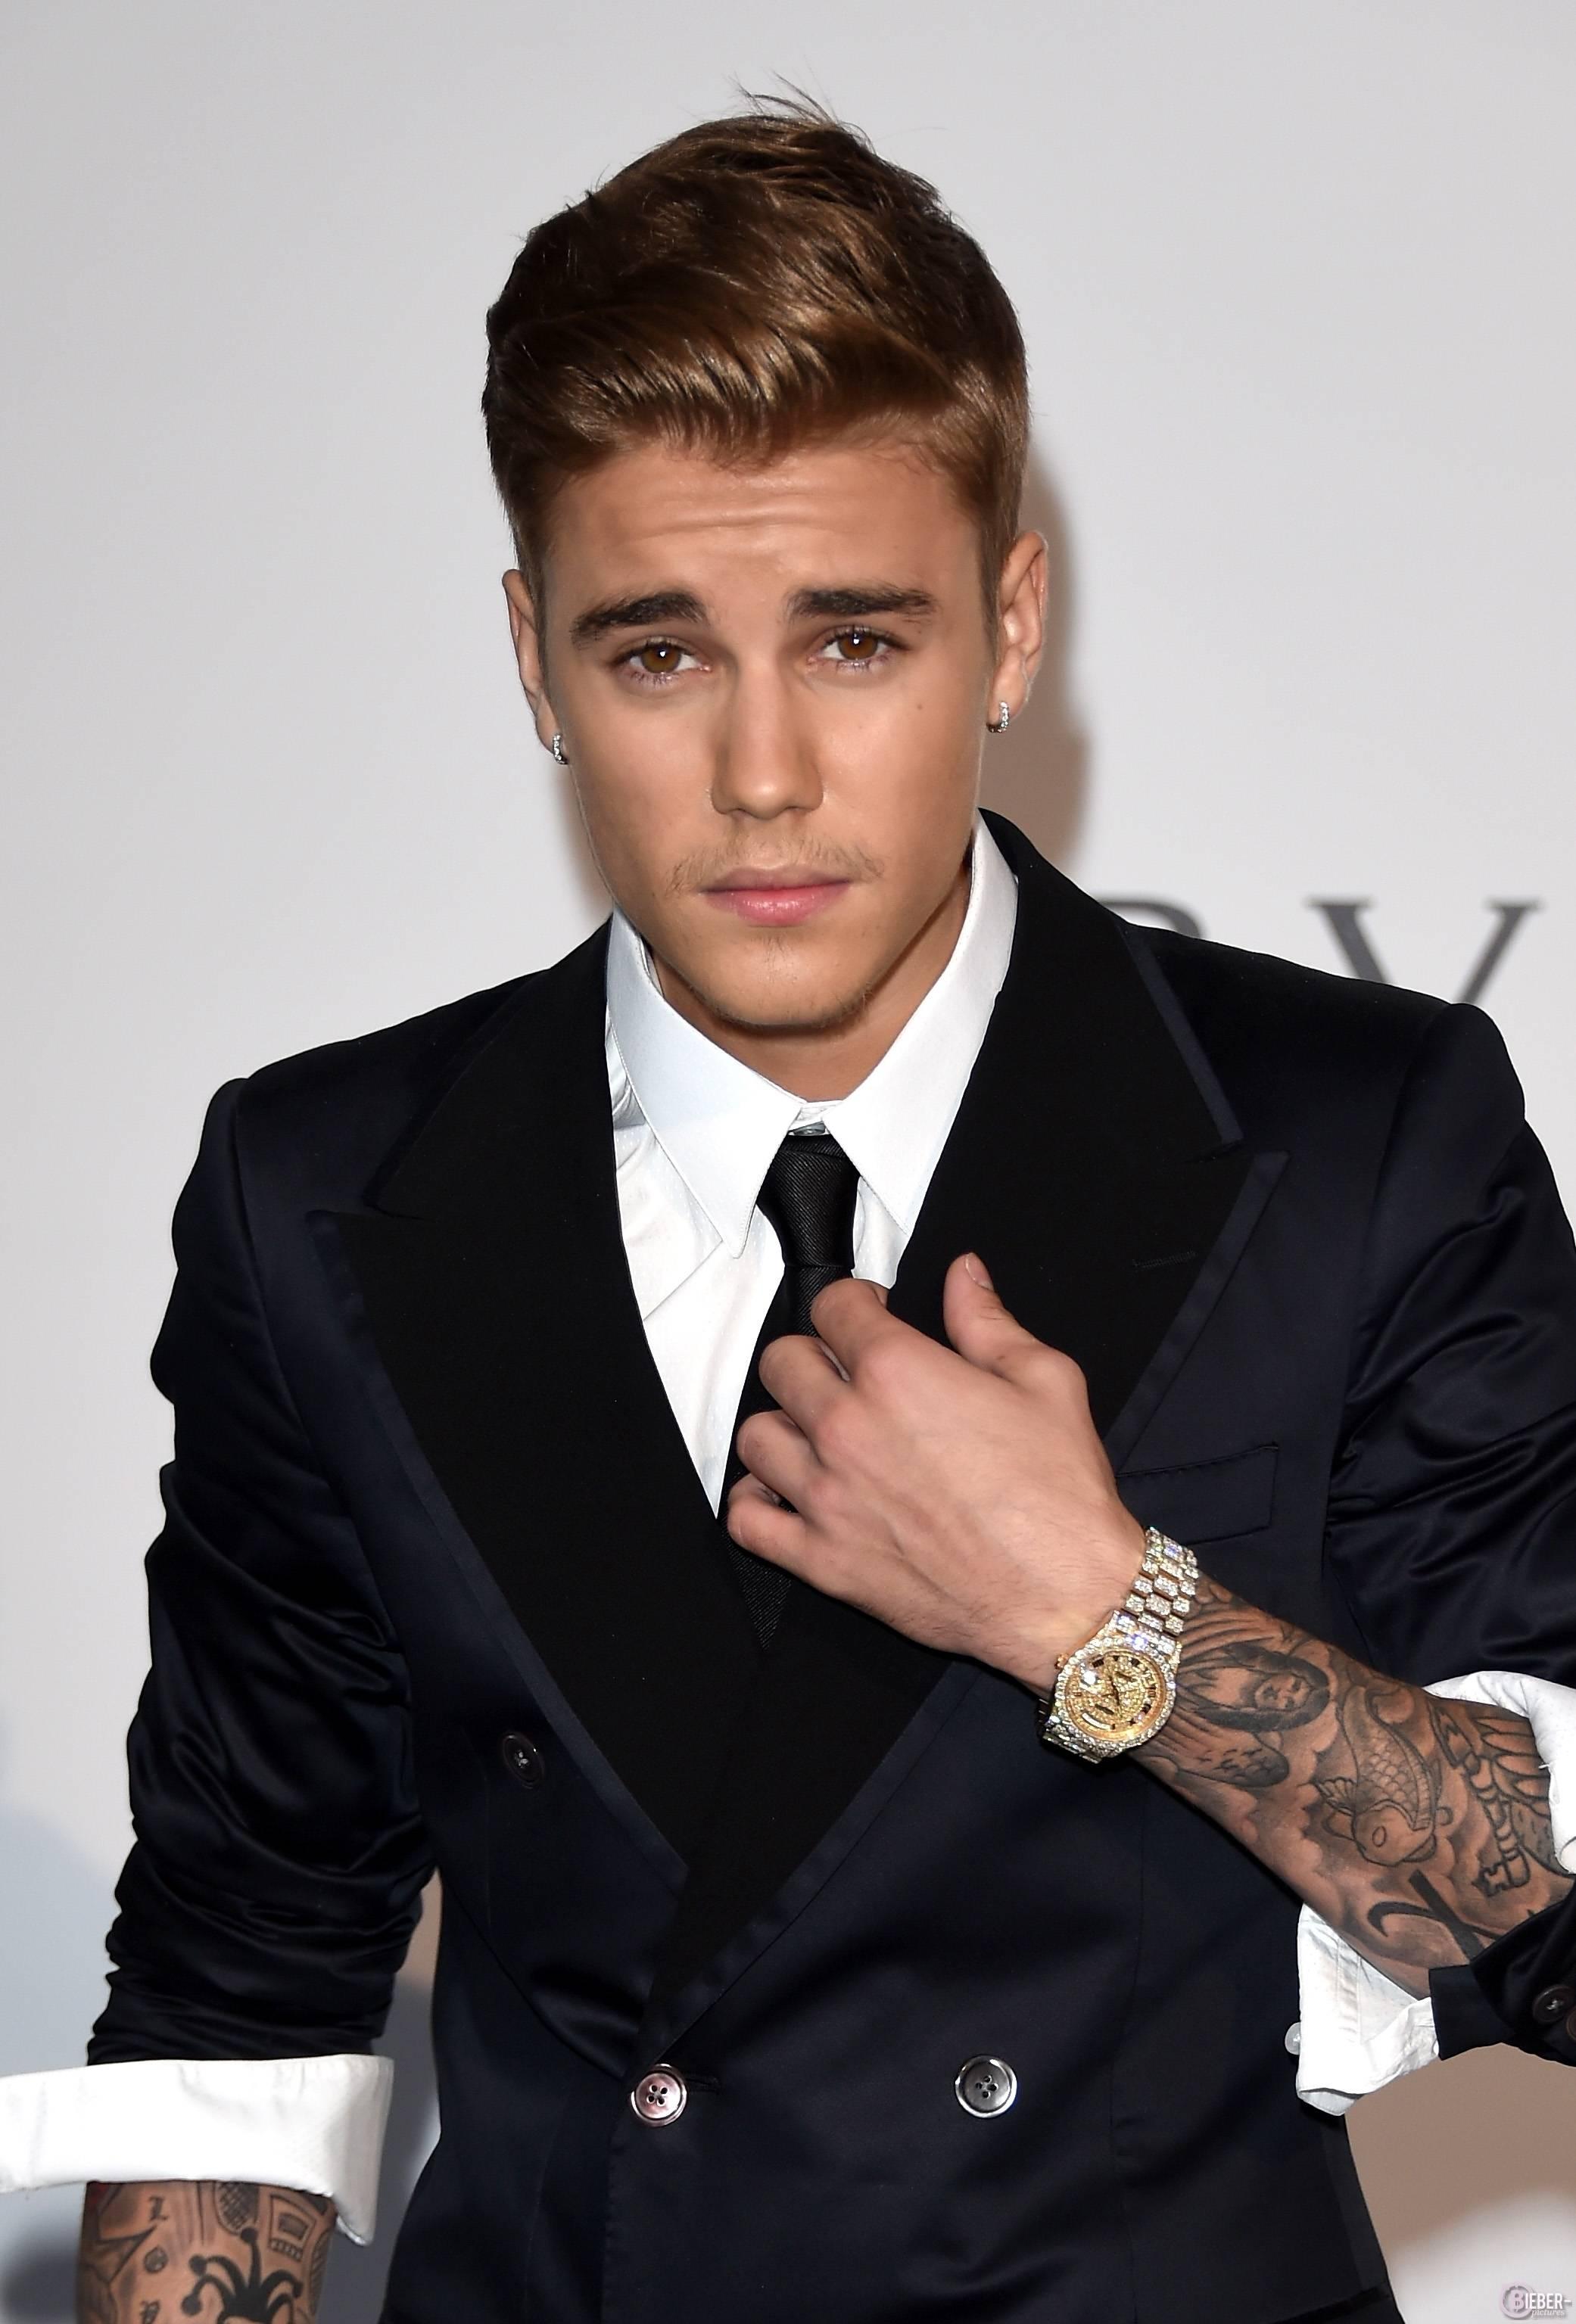 Justin Bieber Tumblr Backgrounds 2015  Wallpaper Cave